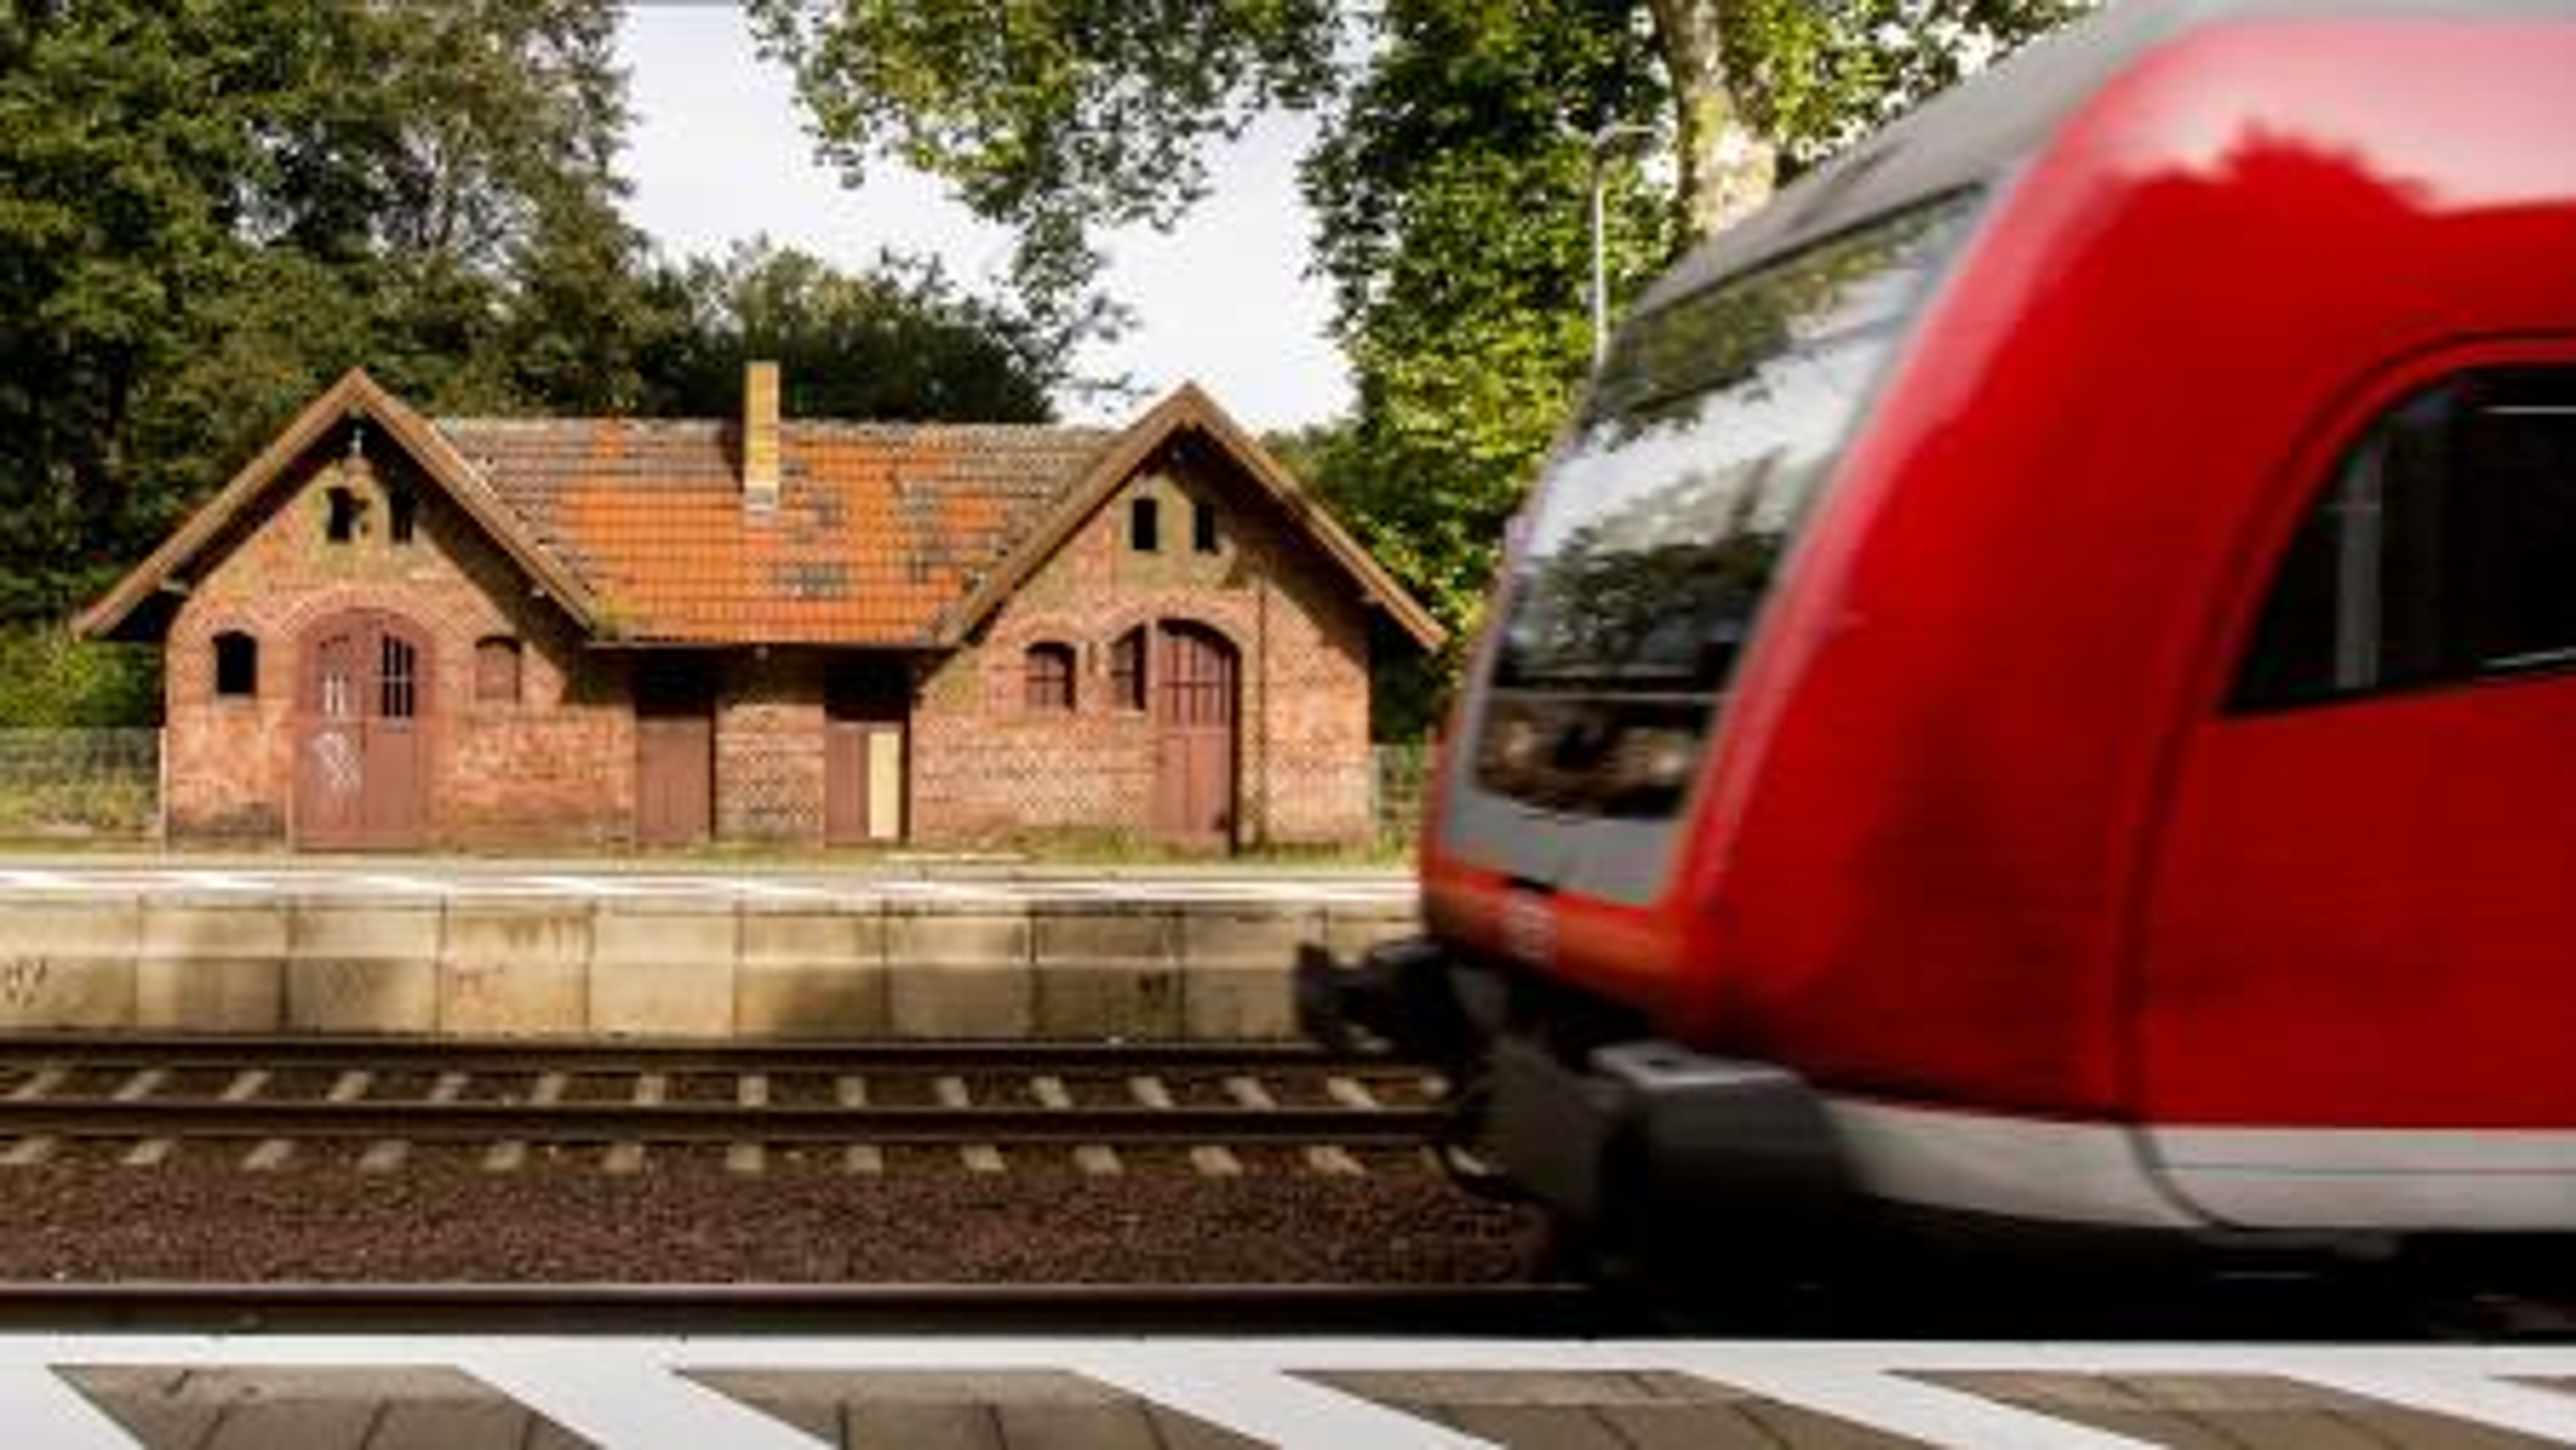 German train tickets go up